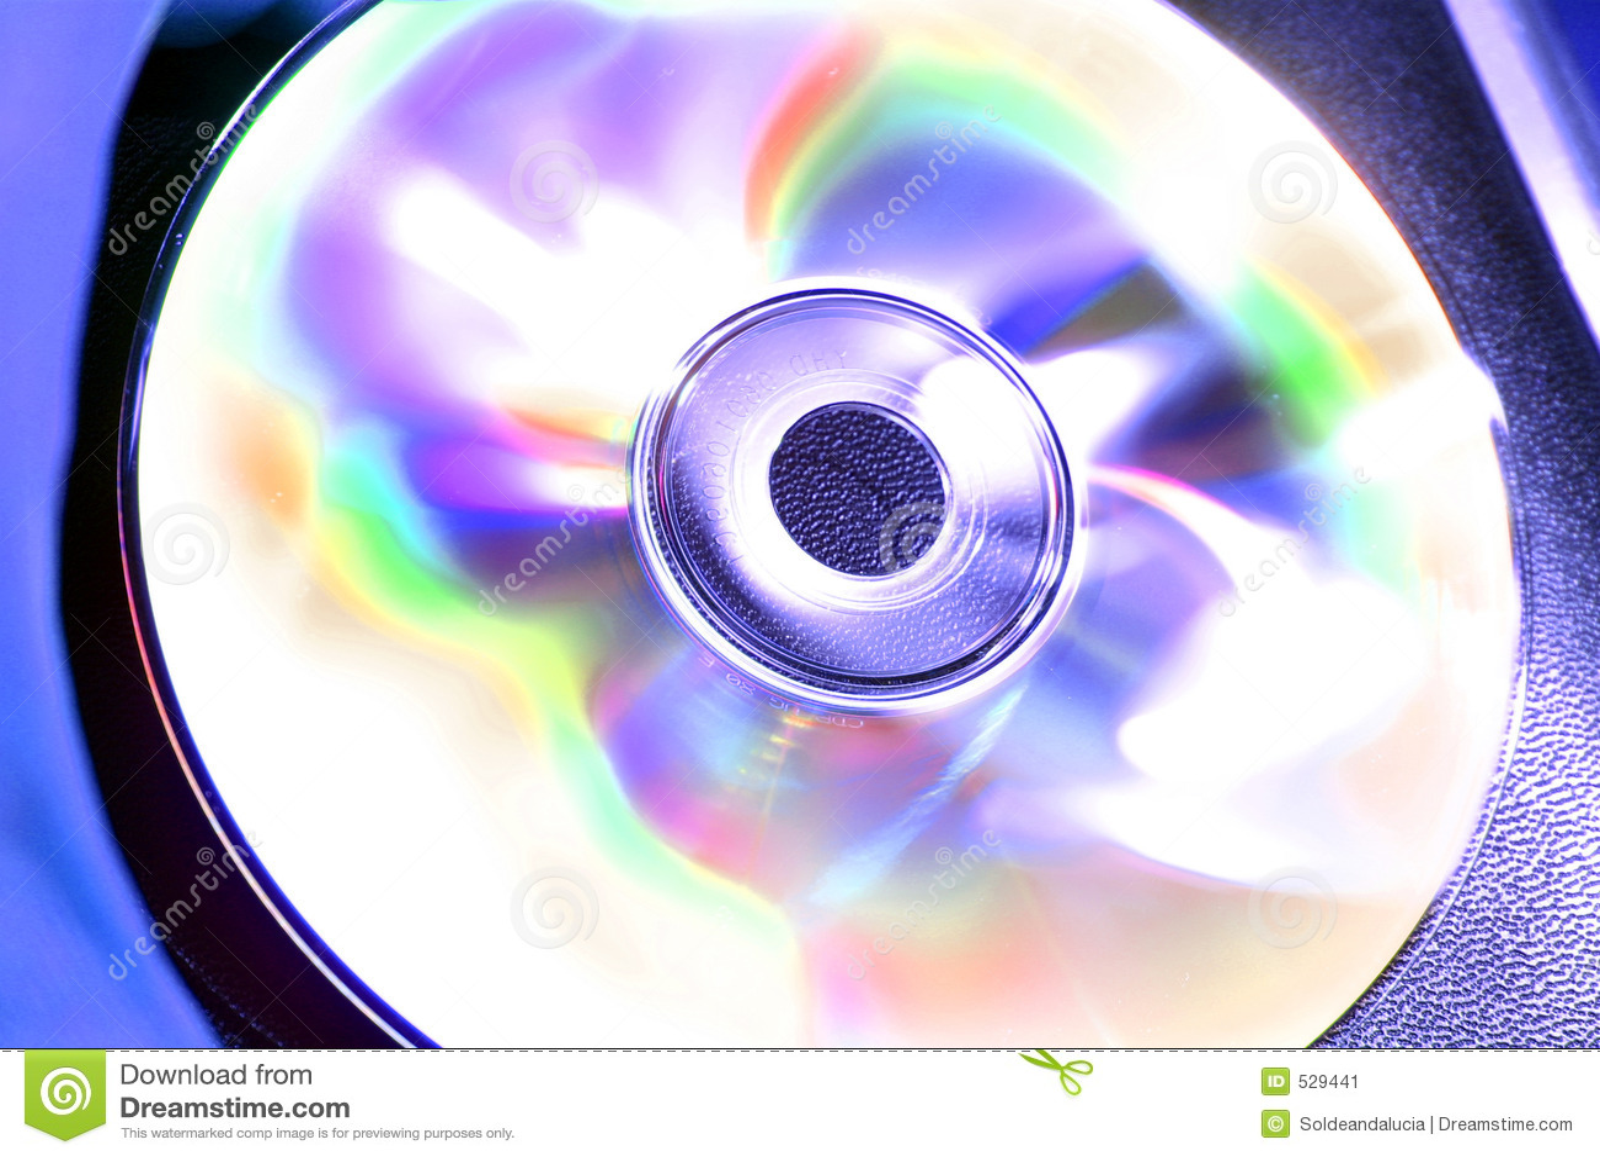 Download CD-ROM 库存图片. 图片 包括有 茄子, 软件, 教育, 激光, 磁盘, 数据, 风土化, 信息, 光盘 - 529441